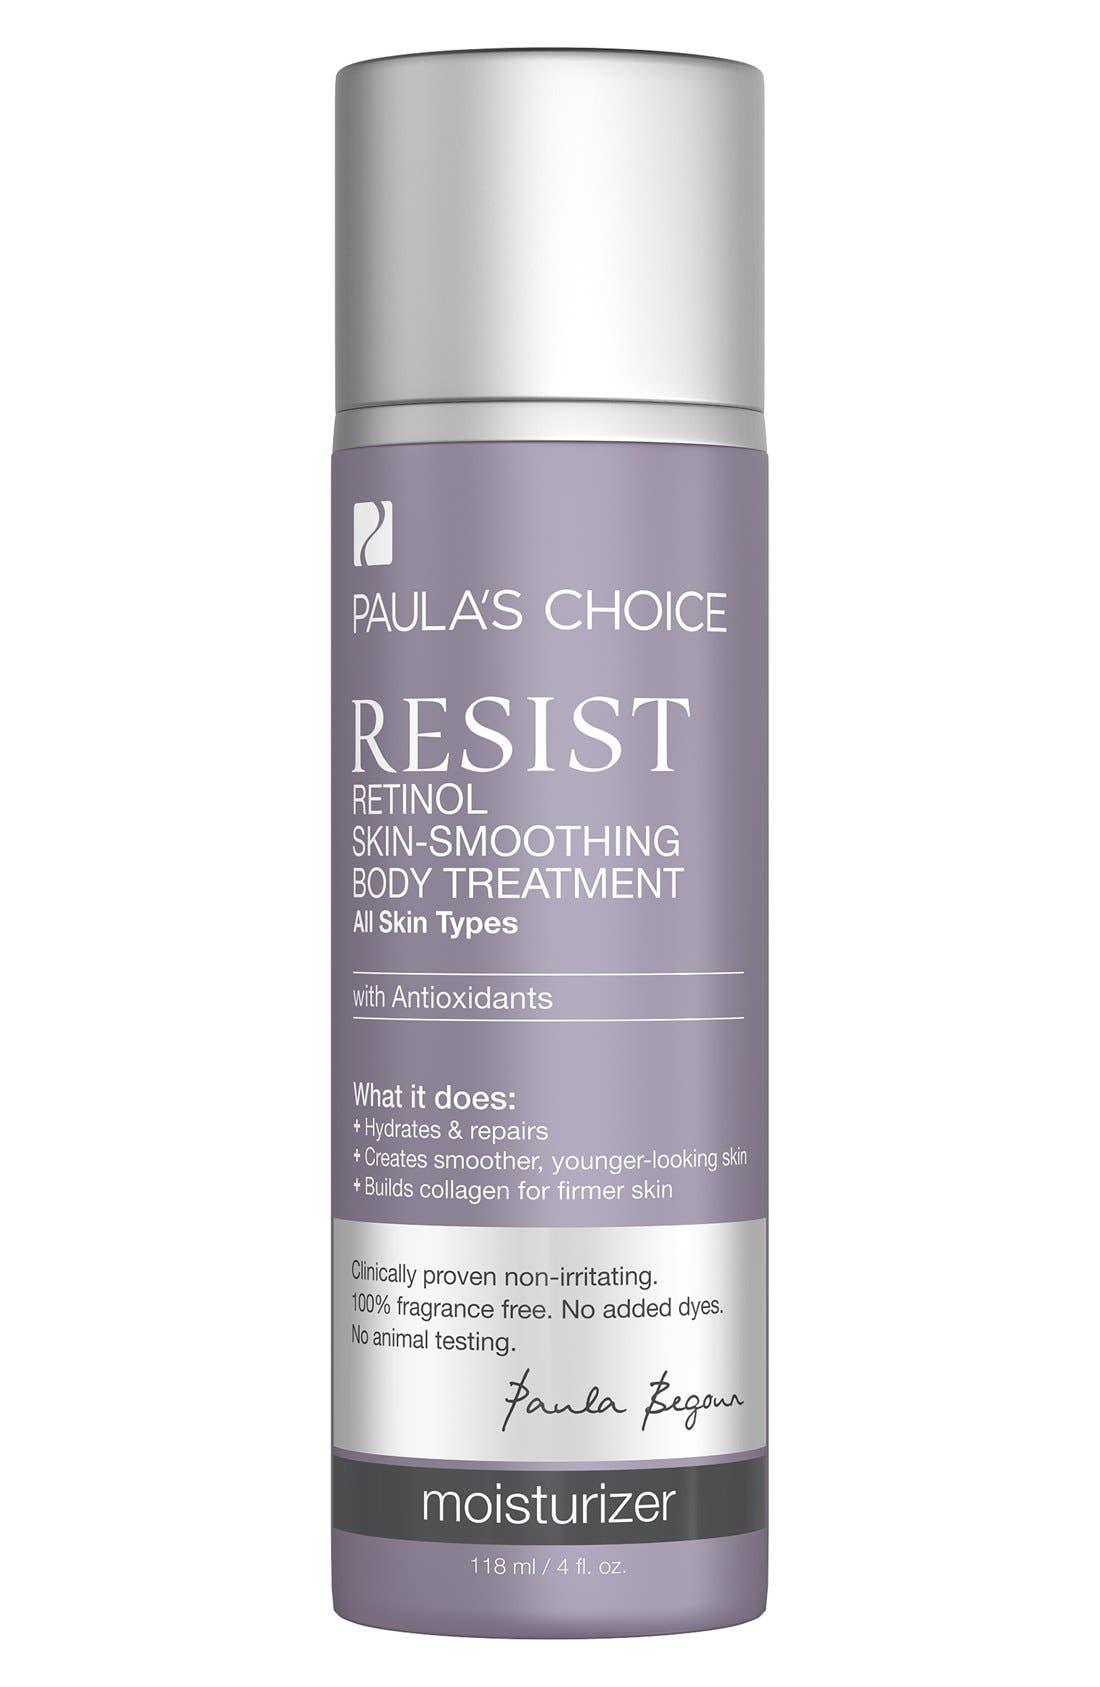 Paula's Choice Resist Retinol Skin Smoothing Body Treatment